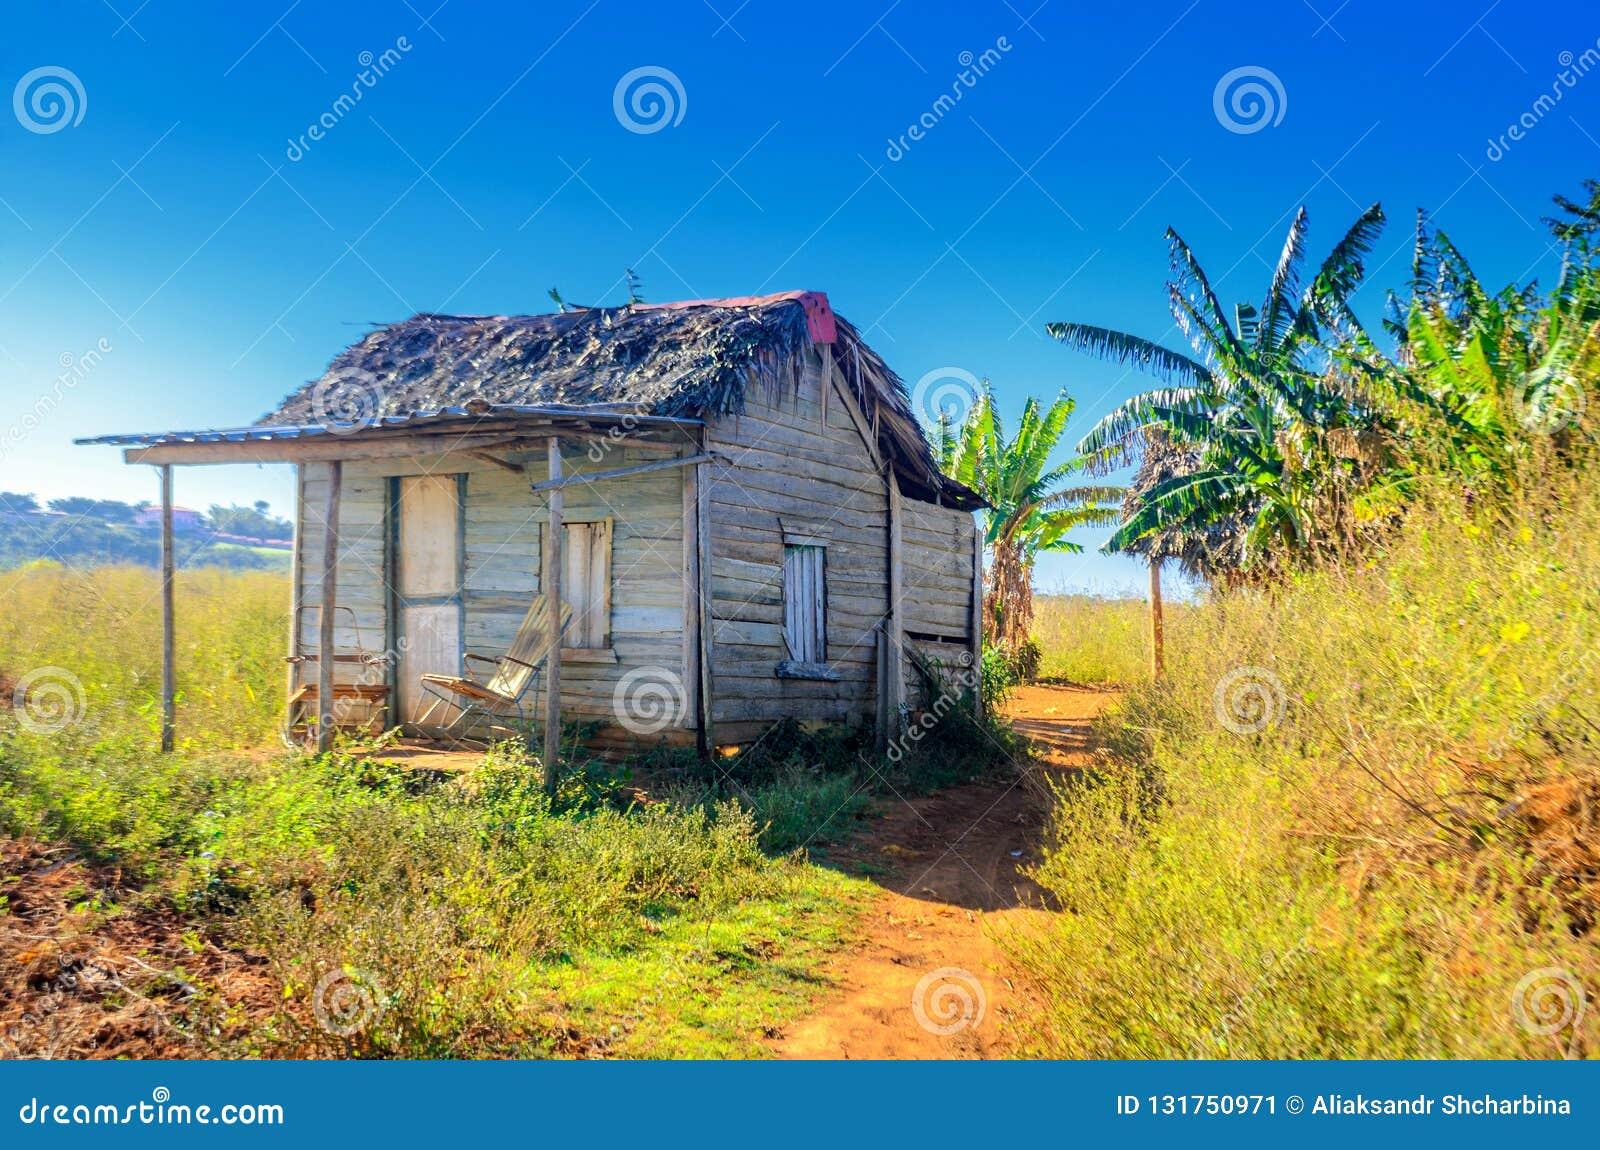 Rural abandoned Cuban tobacco farm